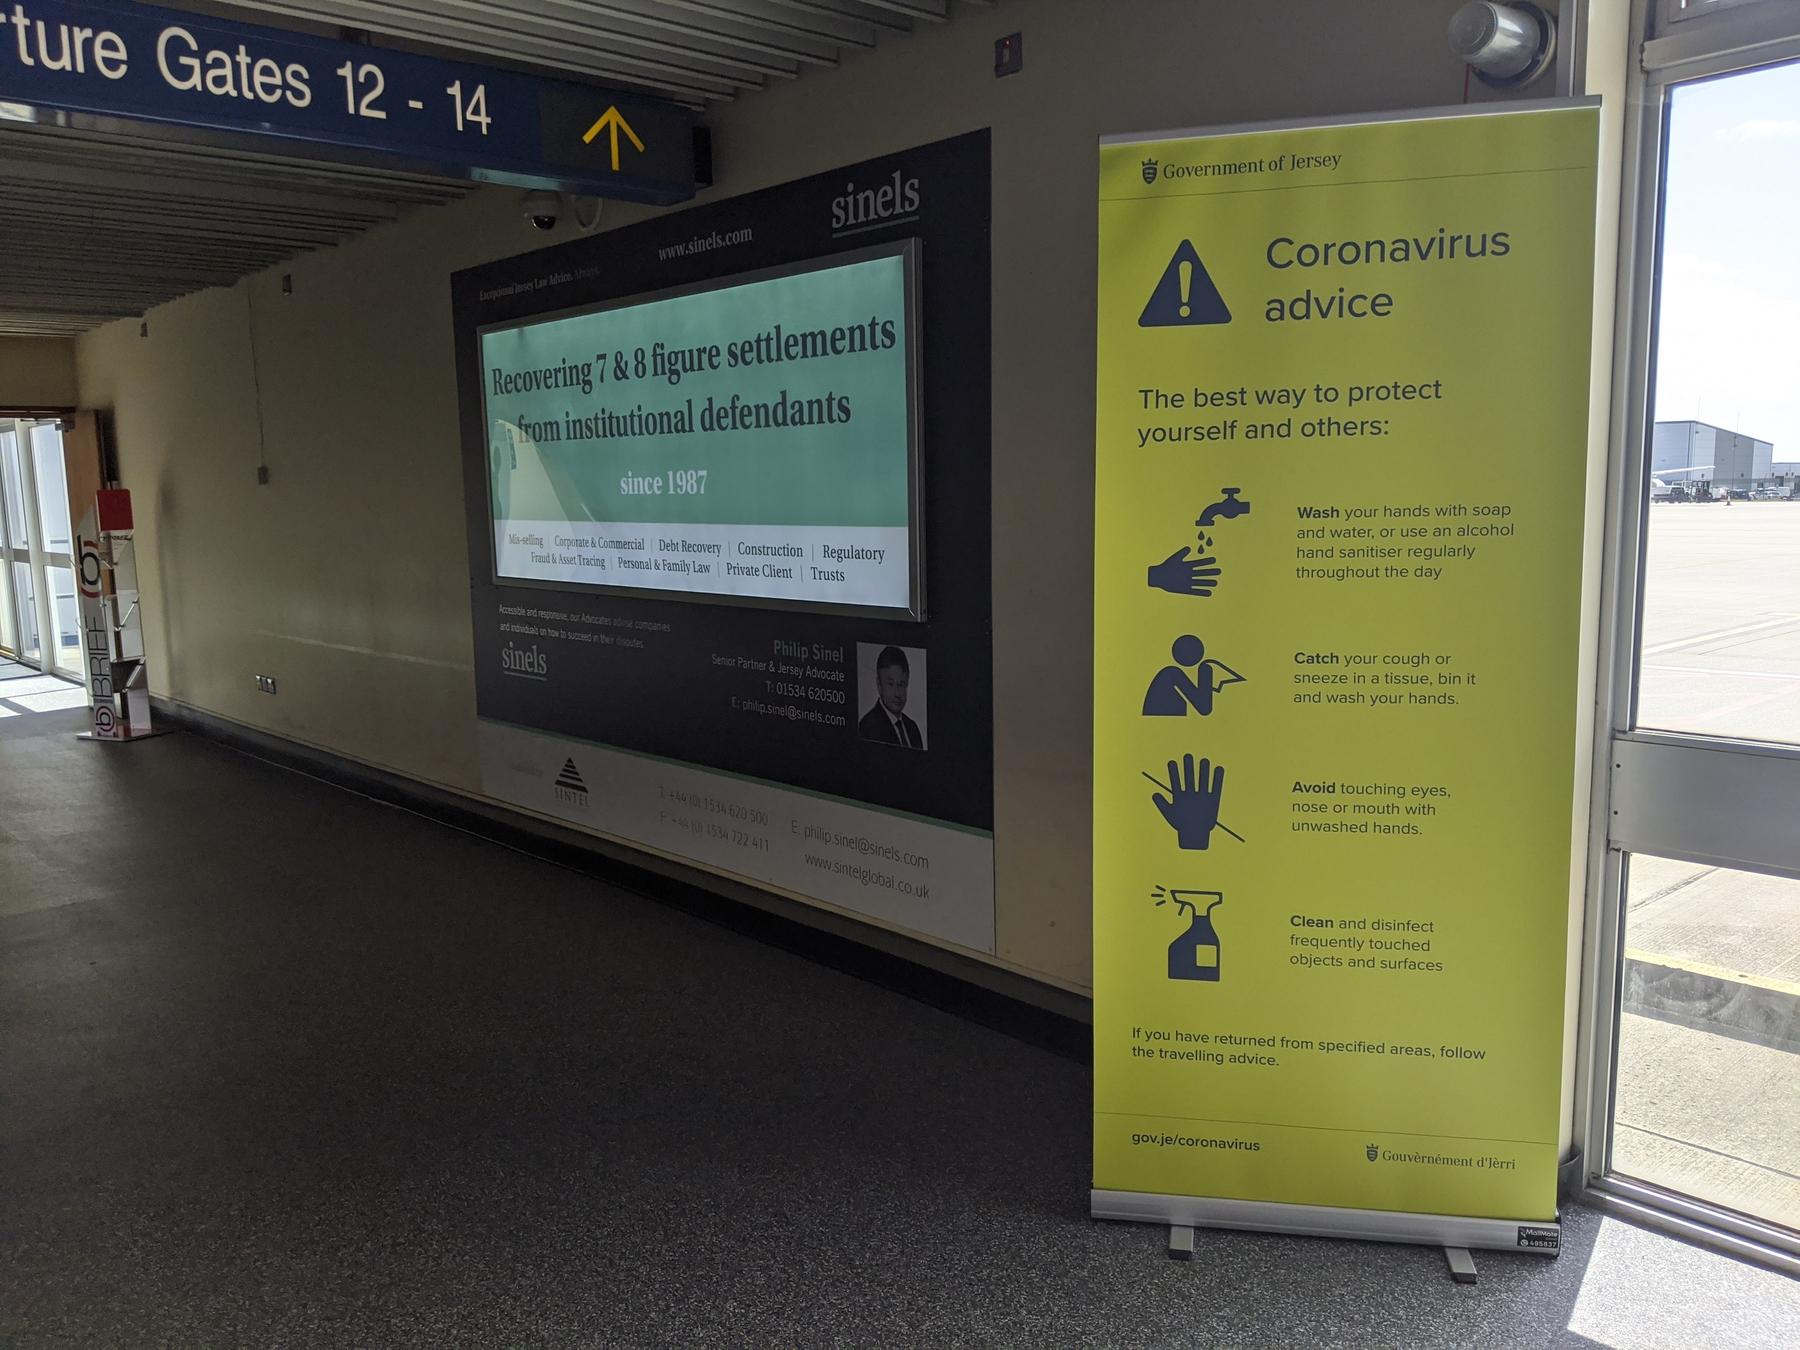 coronavirus advice banner in an airport